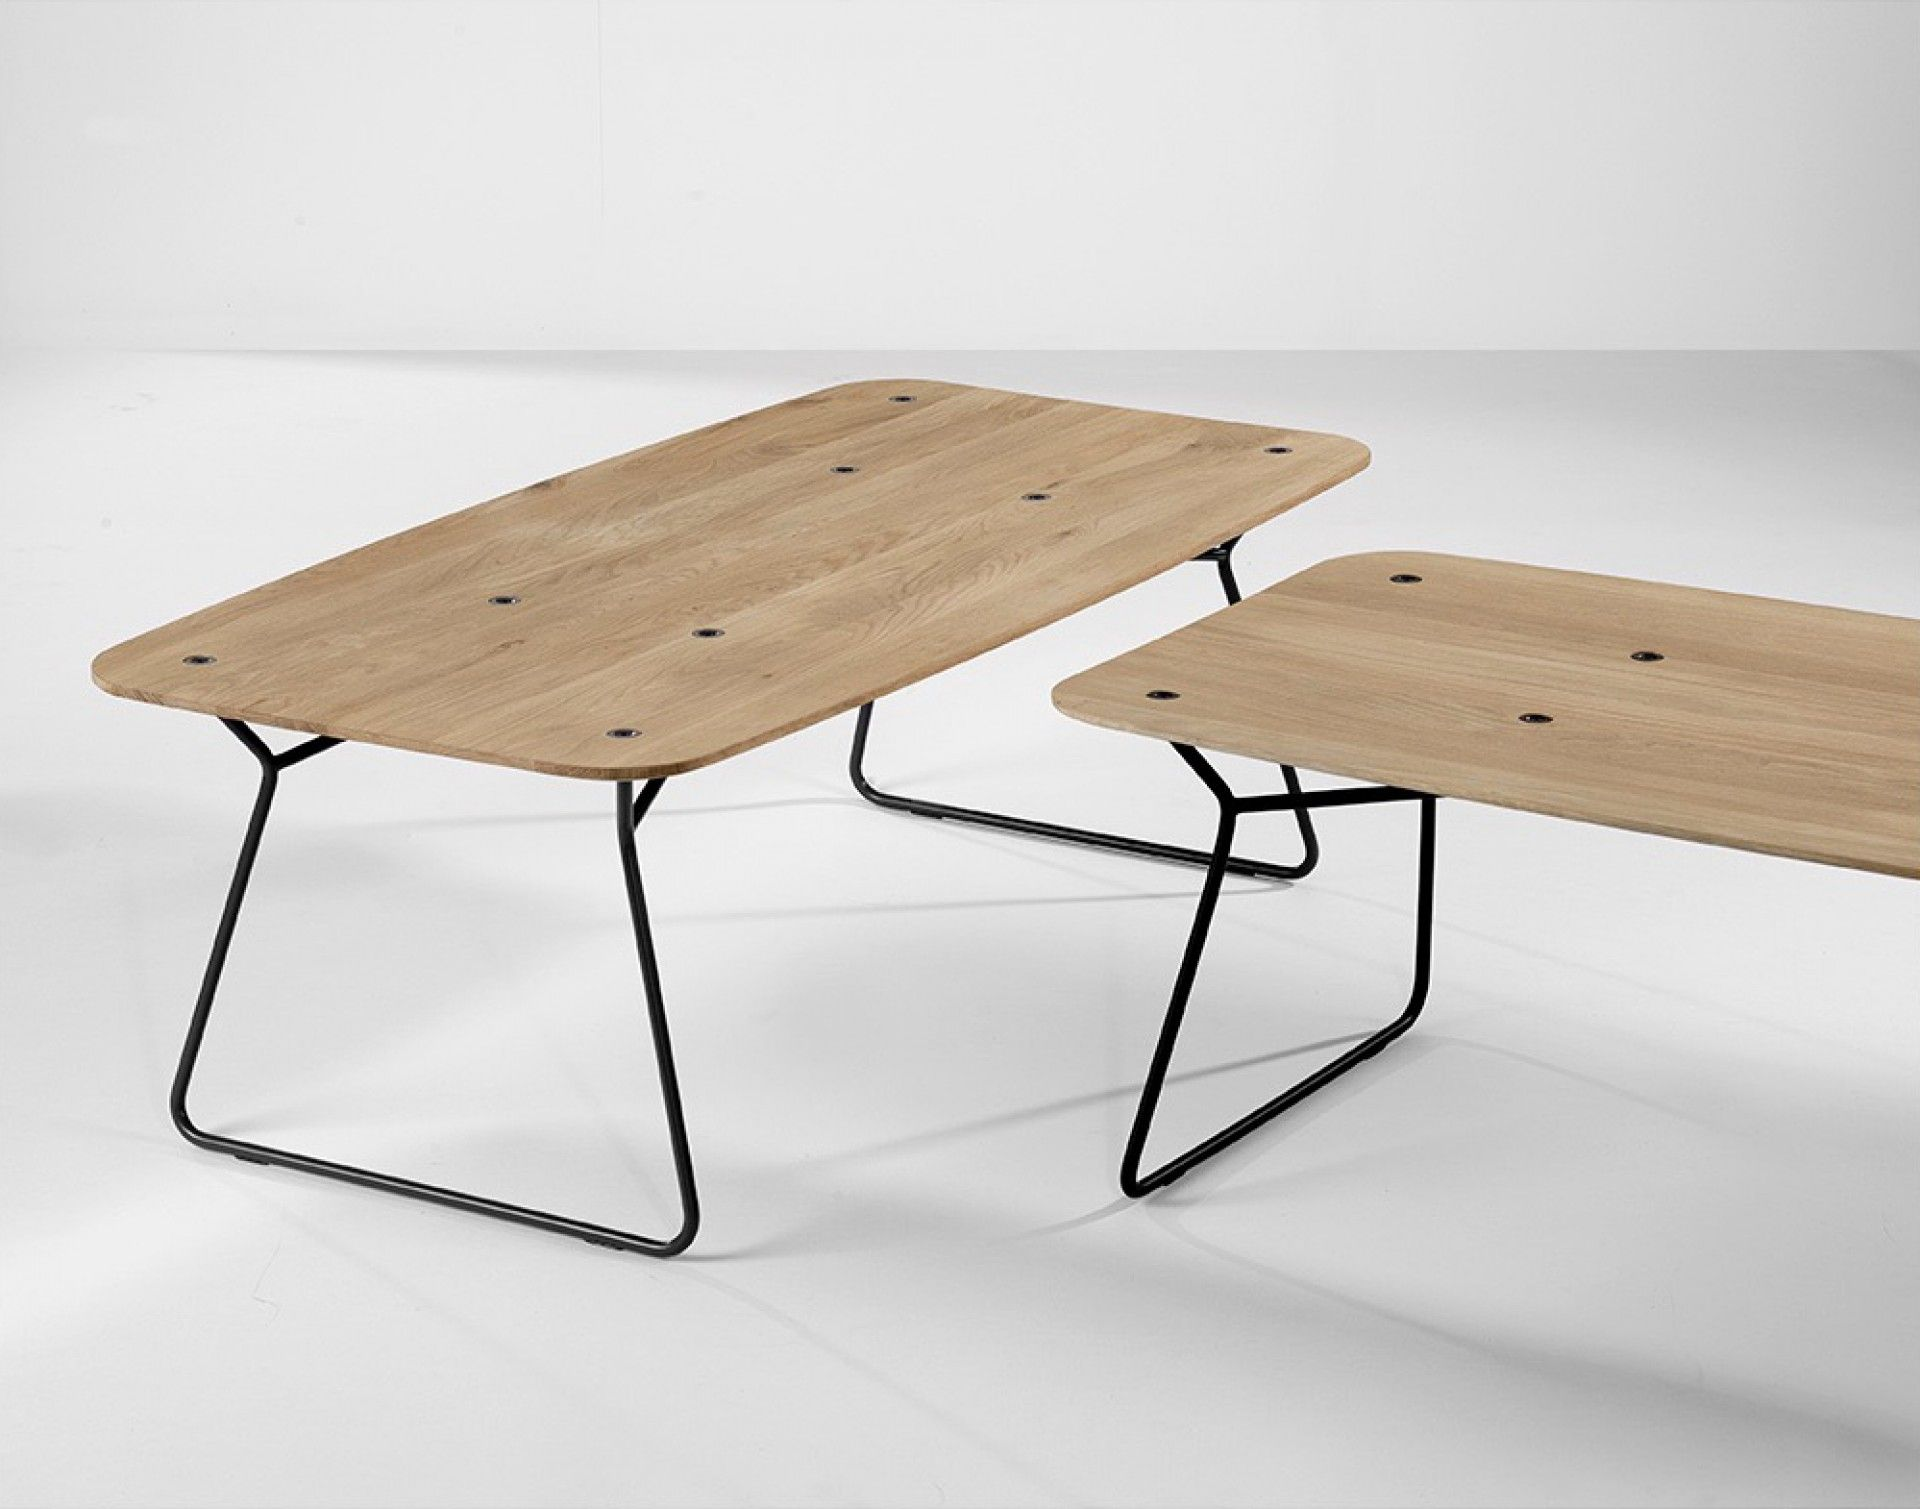 Universo positivo | Y - coffee table | metal, oak | 120 W x 60 D x 40 H cm | design by Jonas Wahlström